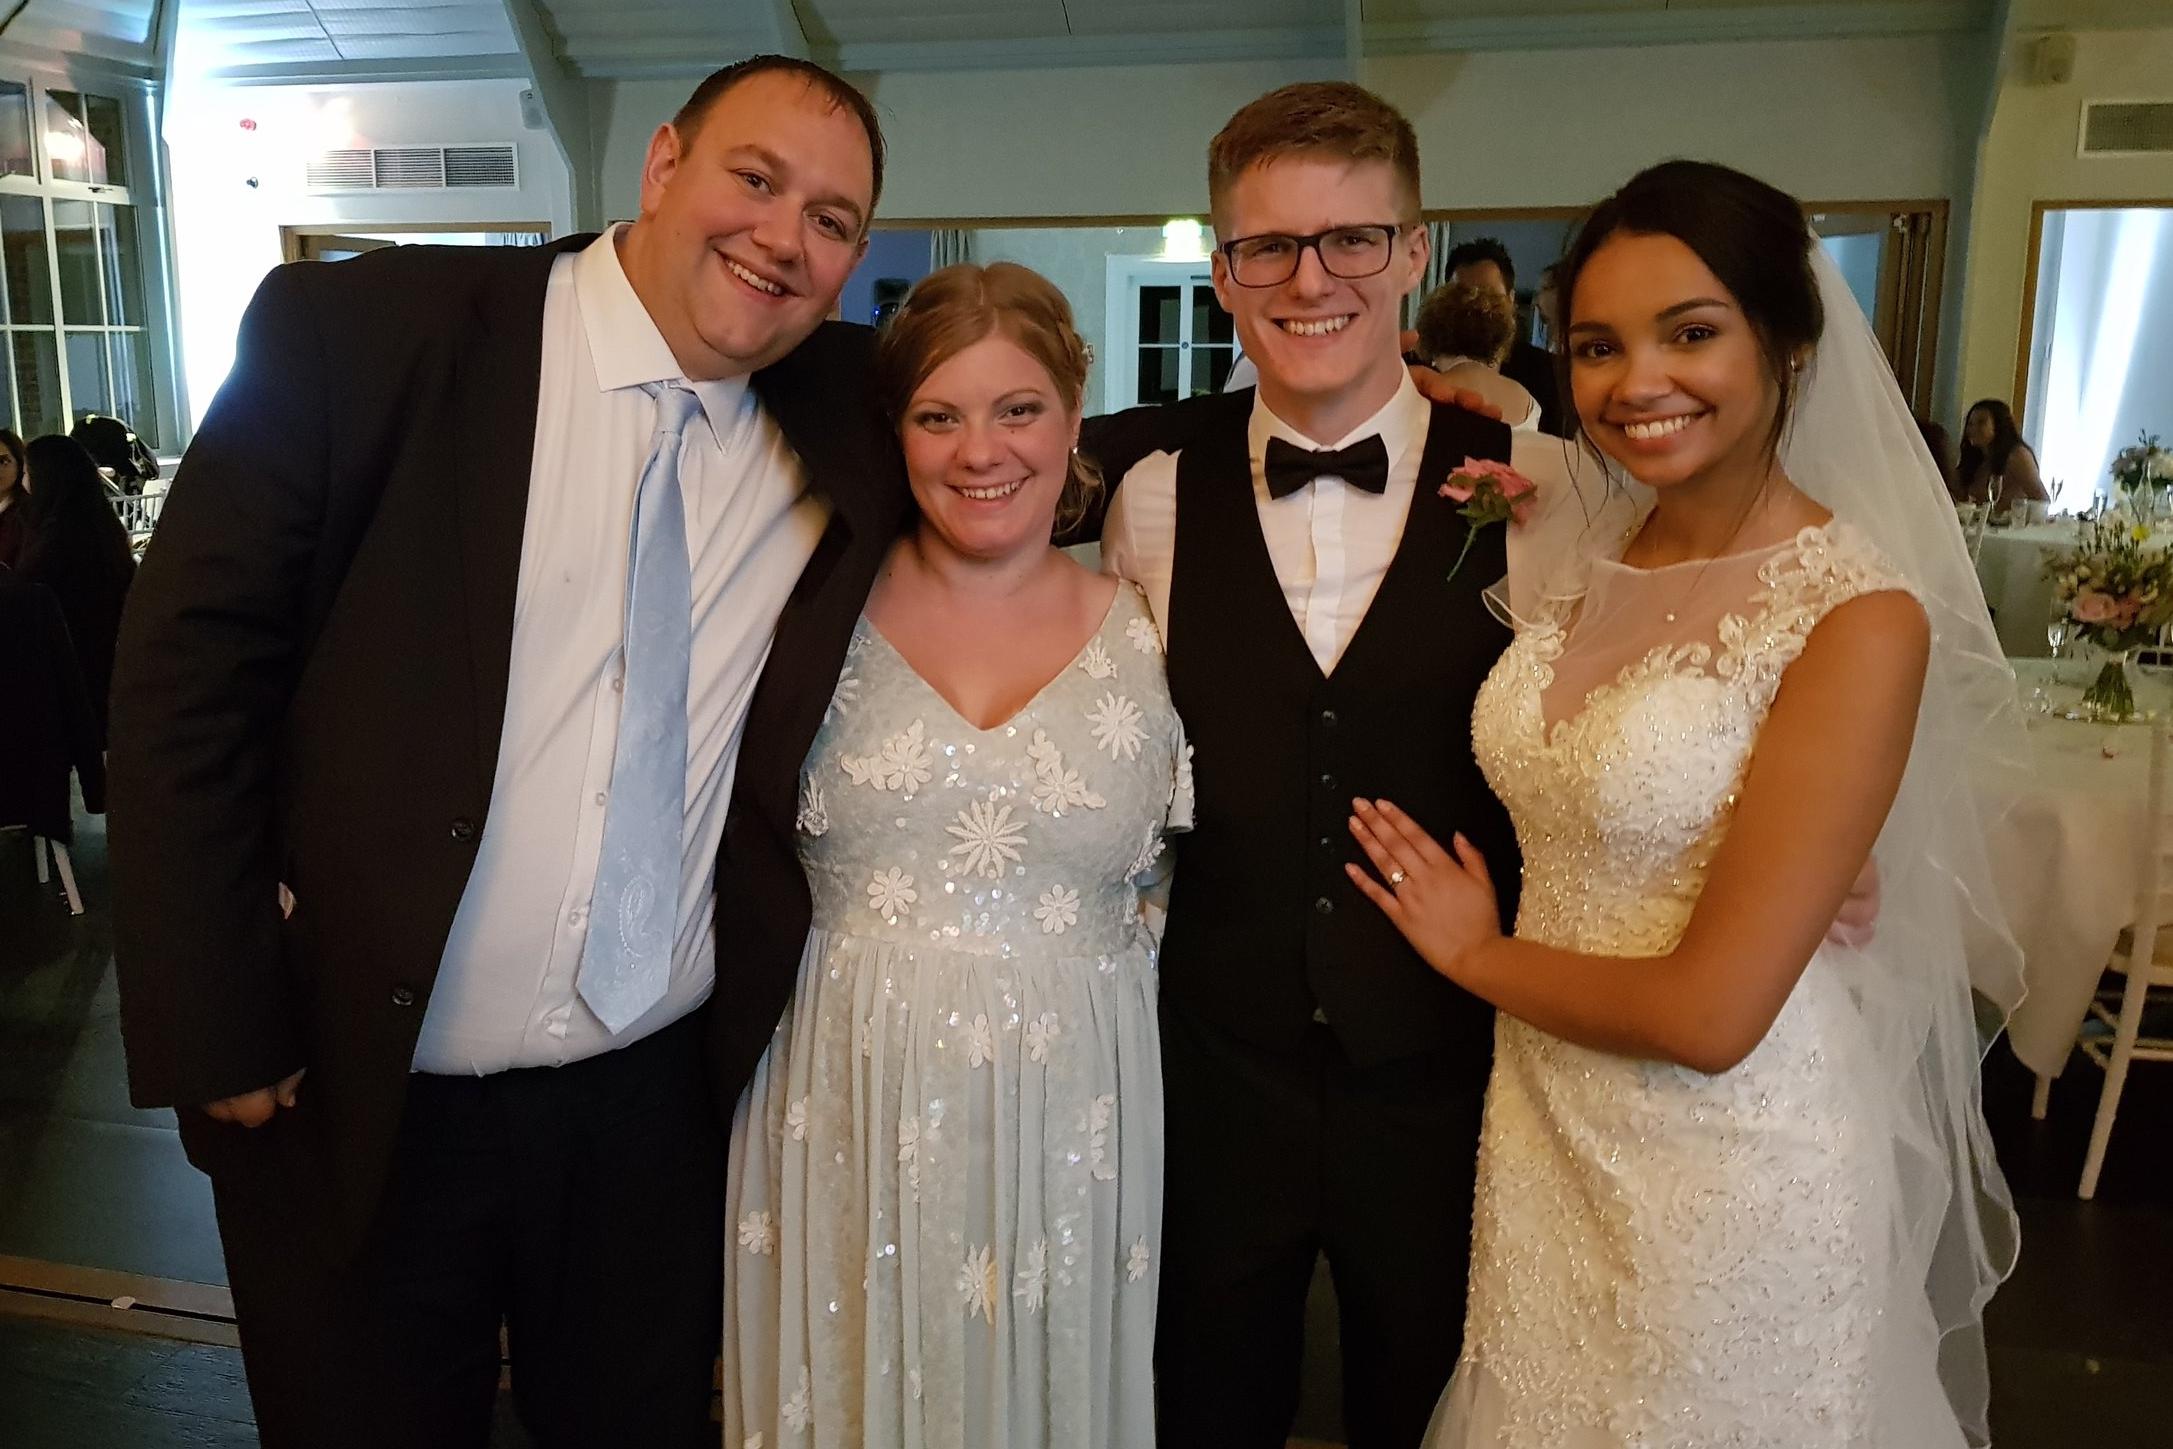 Samuel & Megan's wedding day, wearing ELVI's SENCHAEmbellished Midi Dress